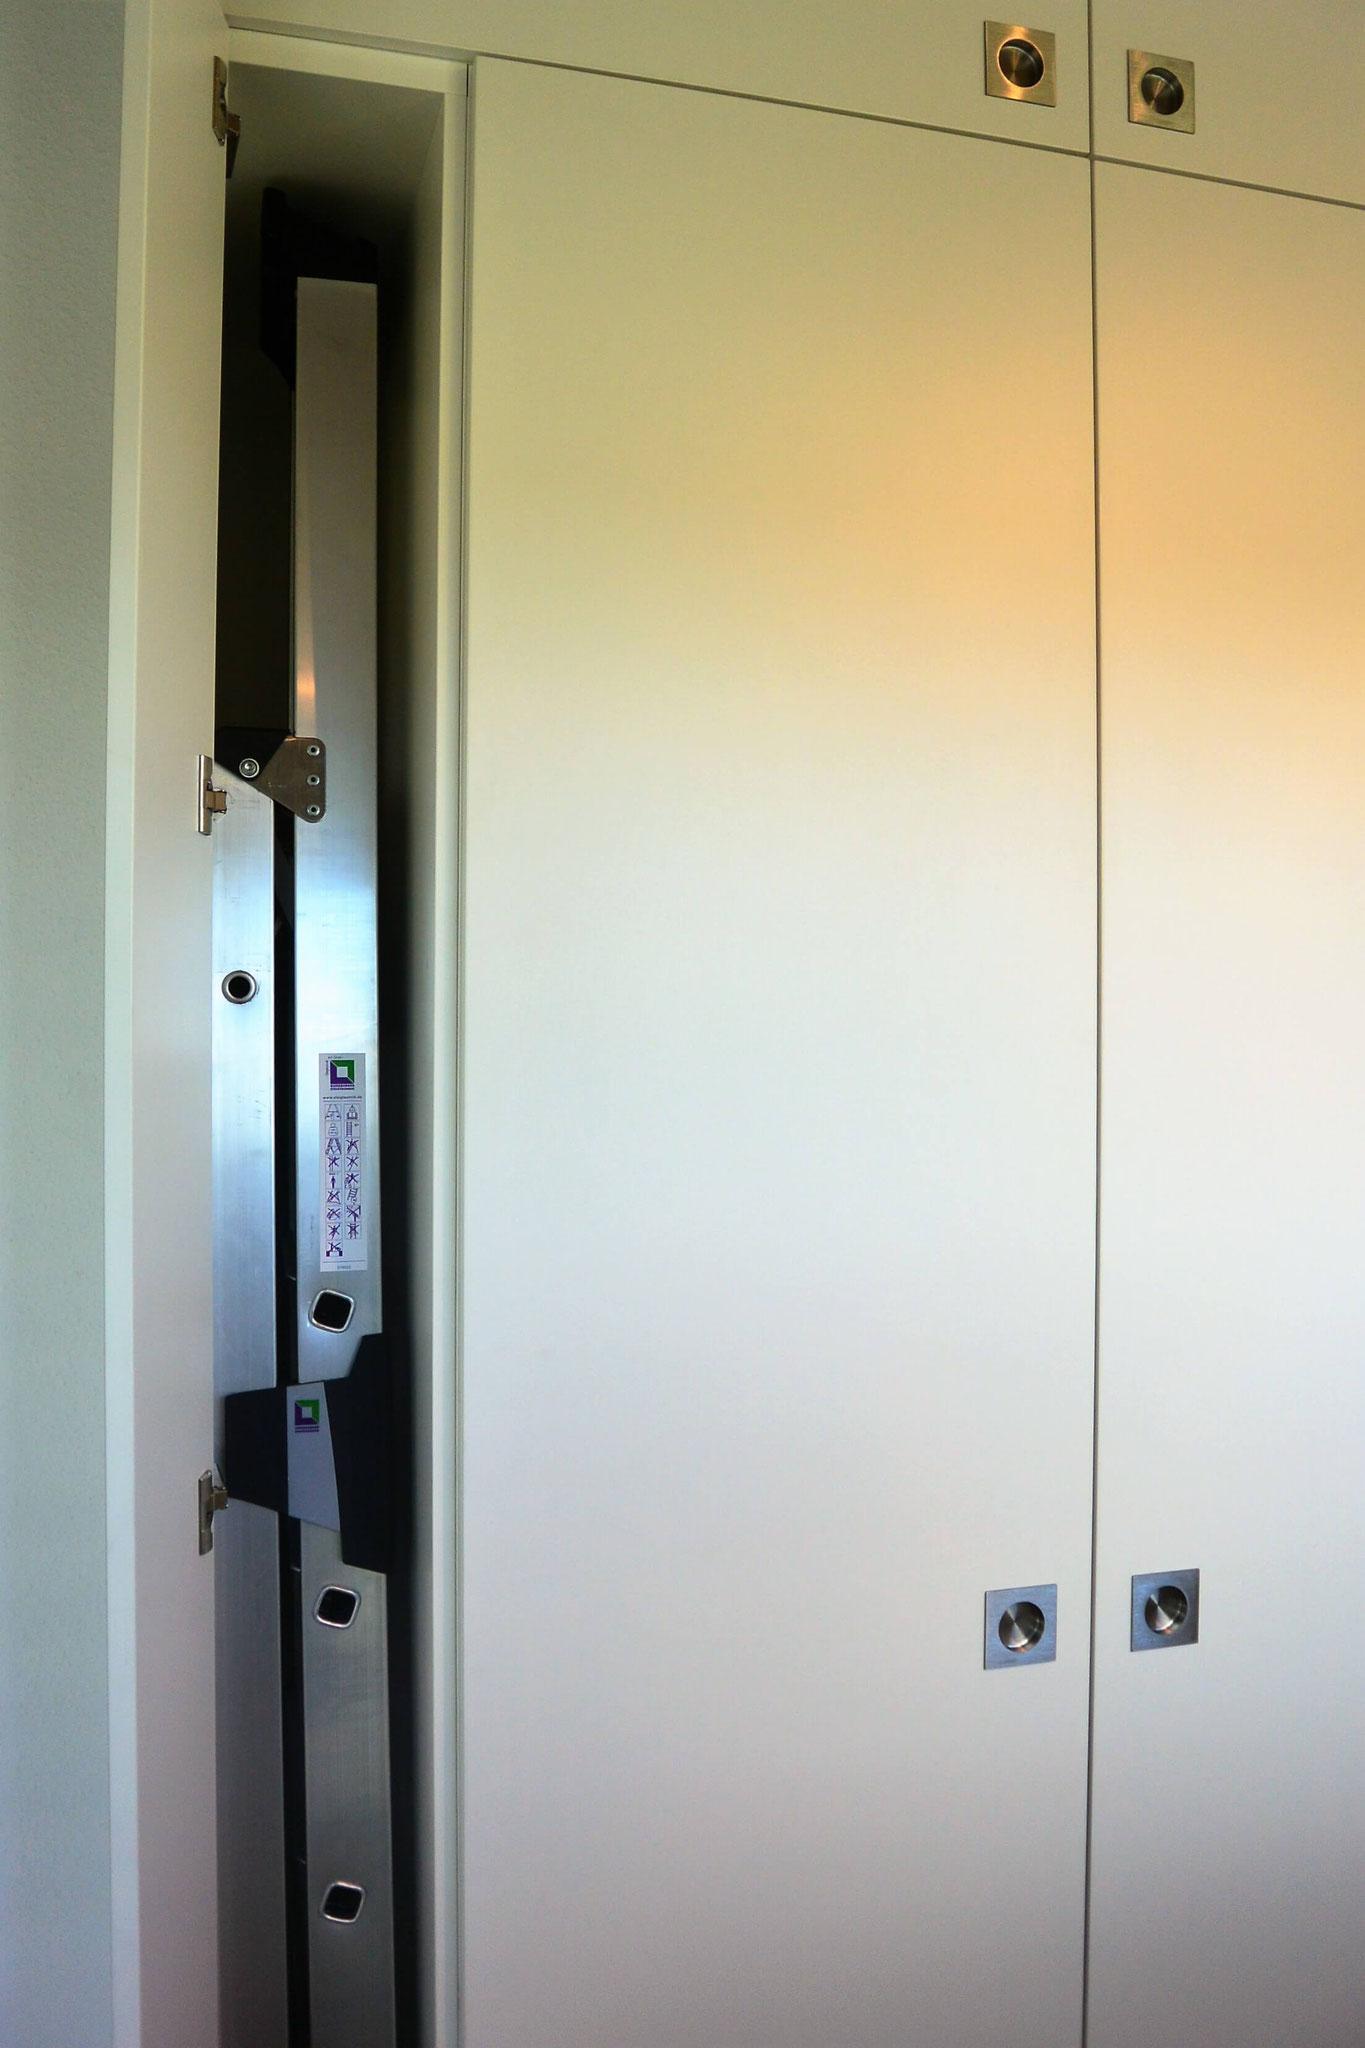 Begehbarer Kleiderschrank Nach Mass Holzdesign Rapp Geisingen